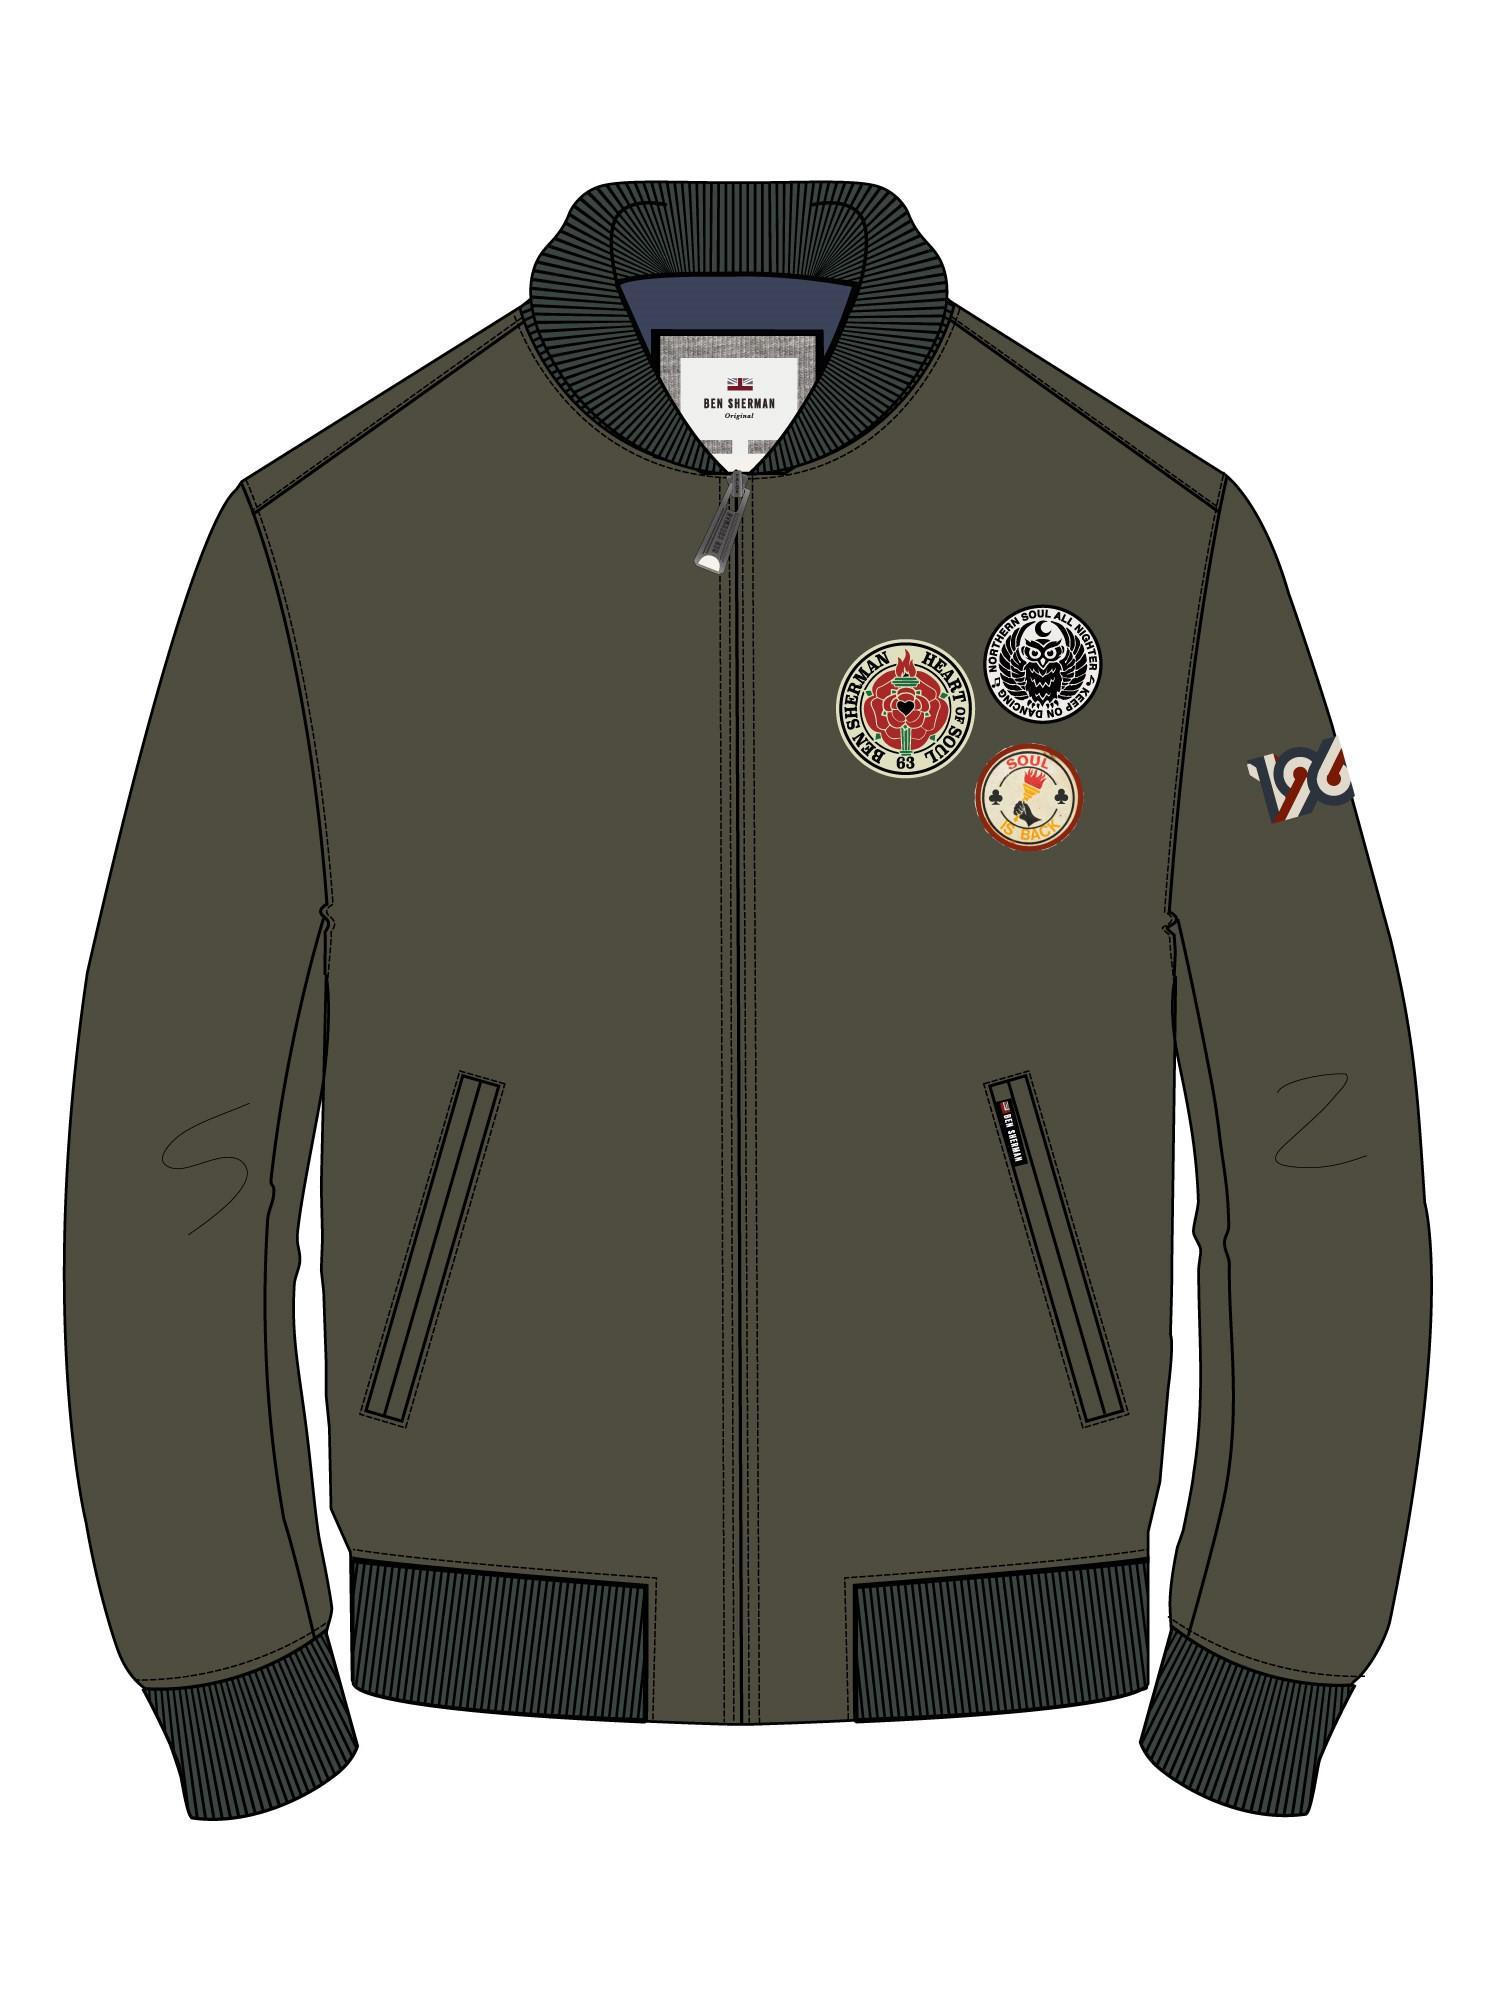 3db6a2fbf Ben Sherman Sateen Badge Bomber in Green for Men - Lyst